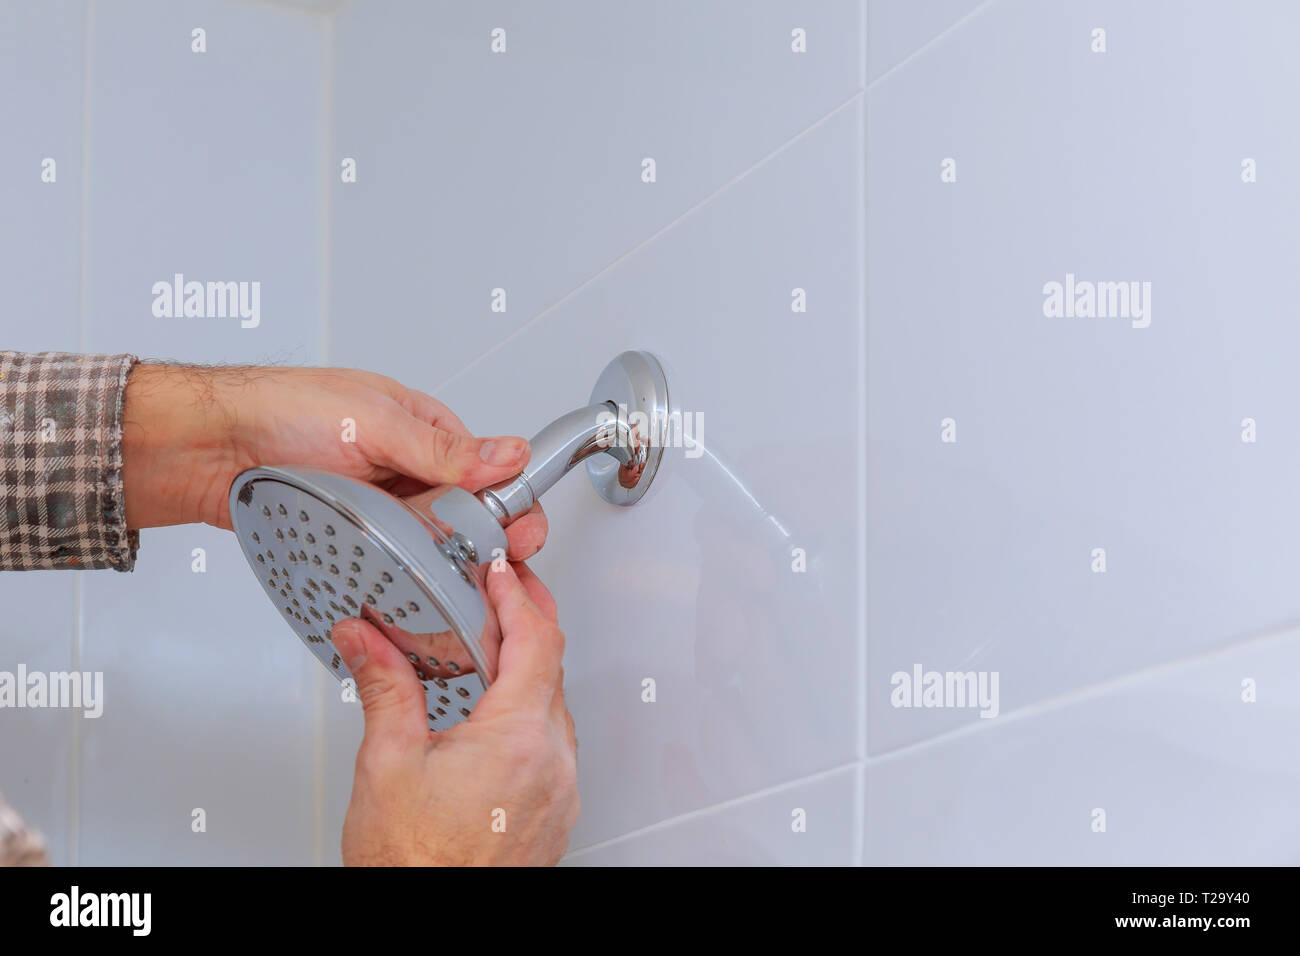 Workman Repairing Shower Head The Plumbing In The Bathroom